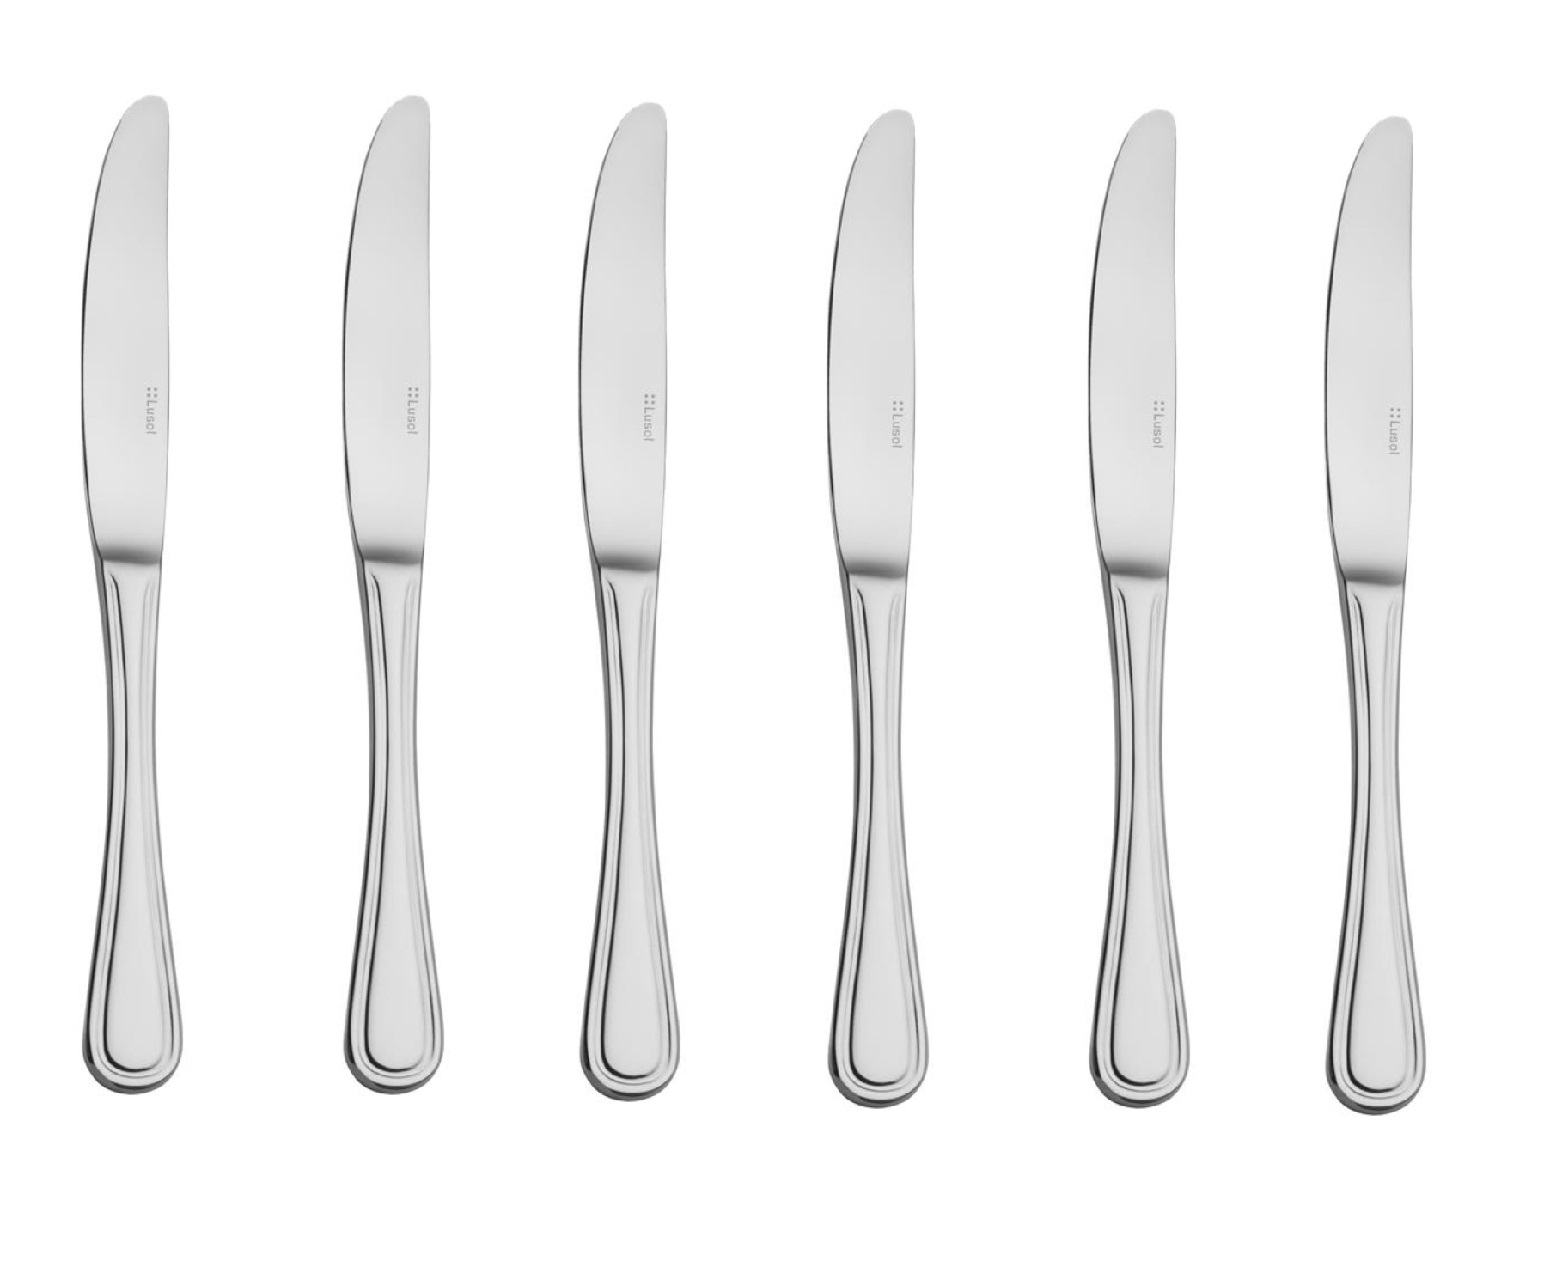 Онлайн каталог PROMENU: Набор ножей столовых Lusol AVALON, длина 23,4 см, серебристый, 6 штук                                   132022